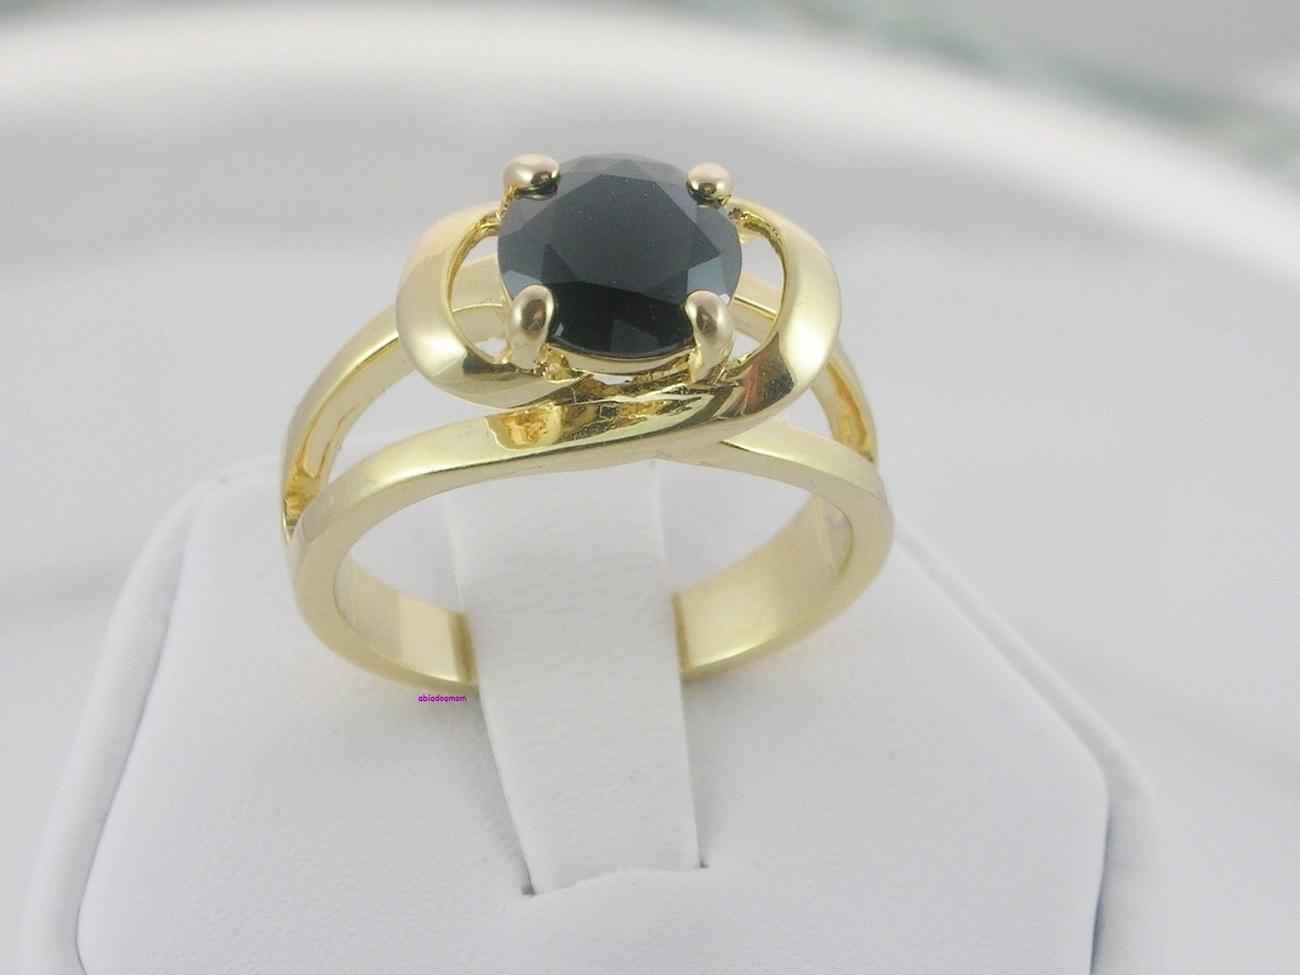 Ladies Ring Black Diamond Cut Solitaire Size 7